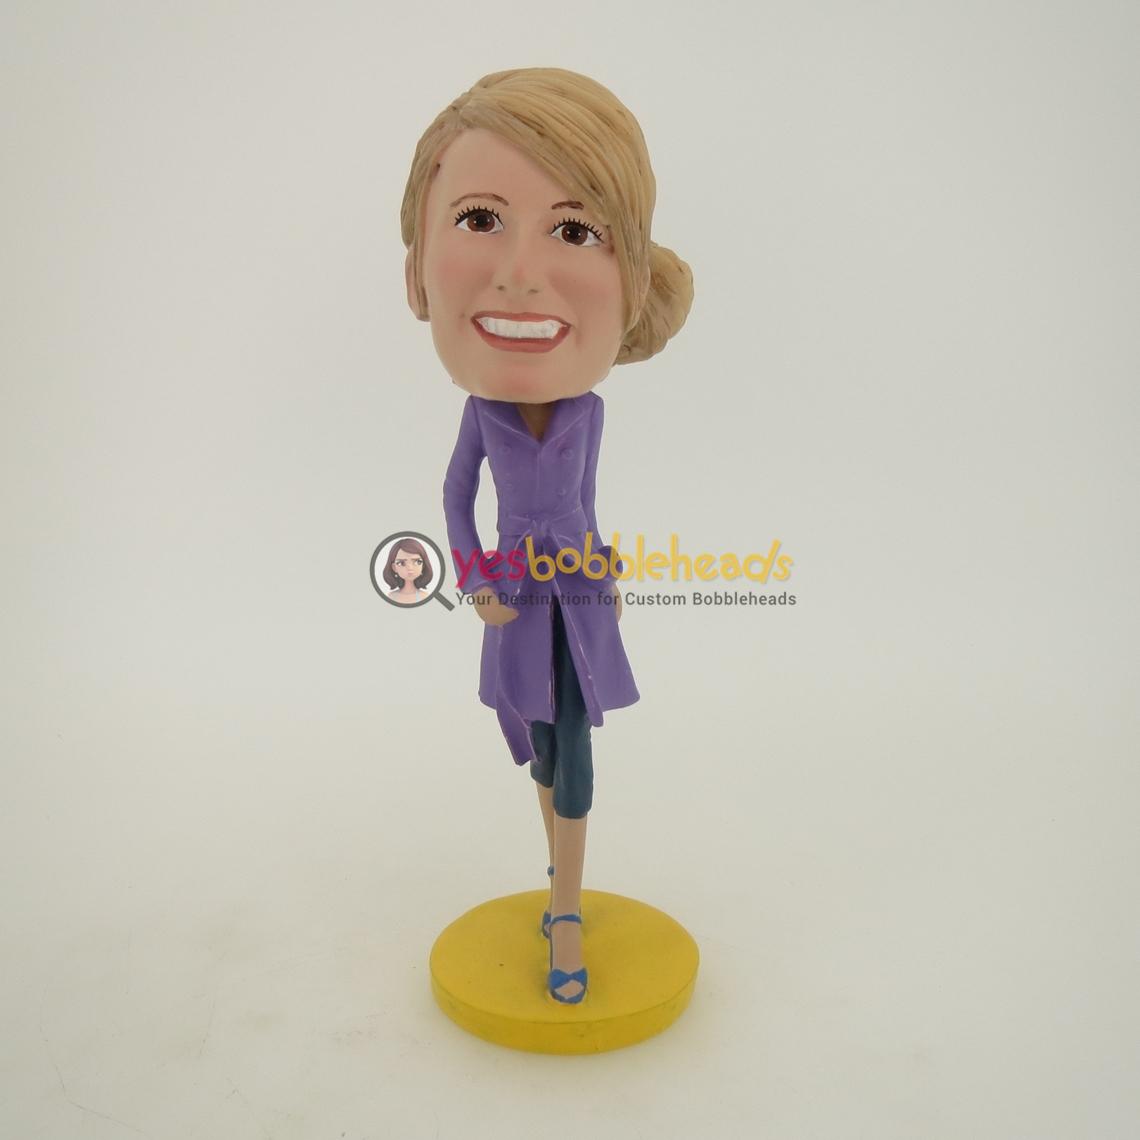 Picture of Custom Bobblehead Doll: Windbreaker Woman